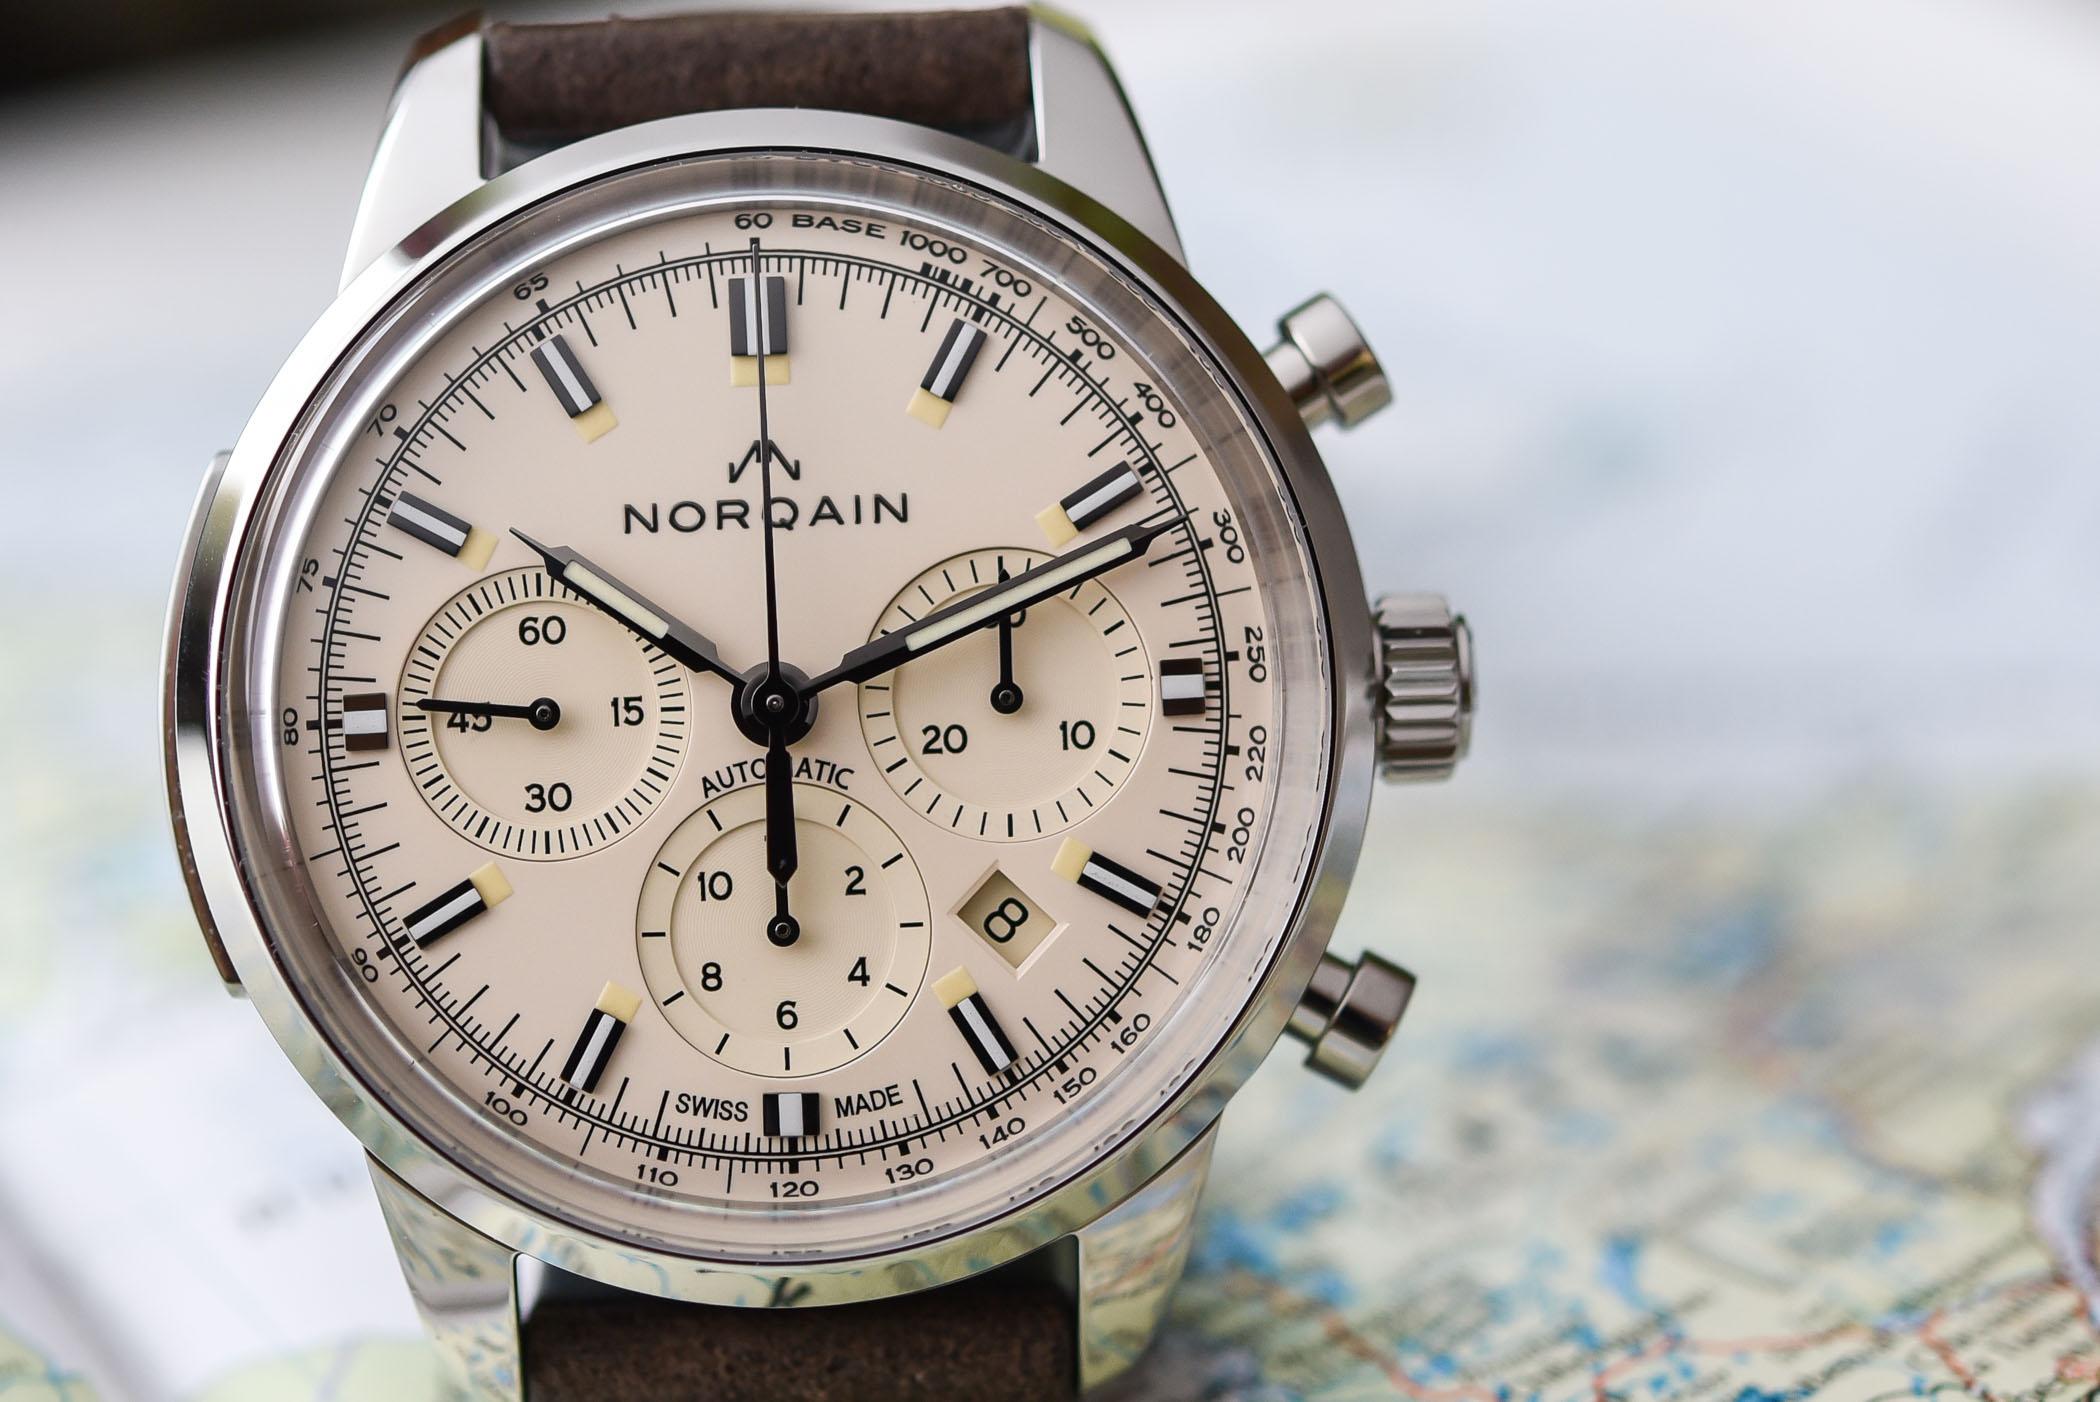 Norqain Freedom 60 Chrono